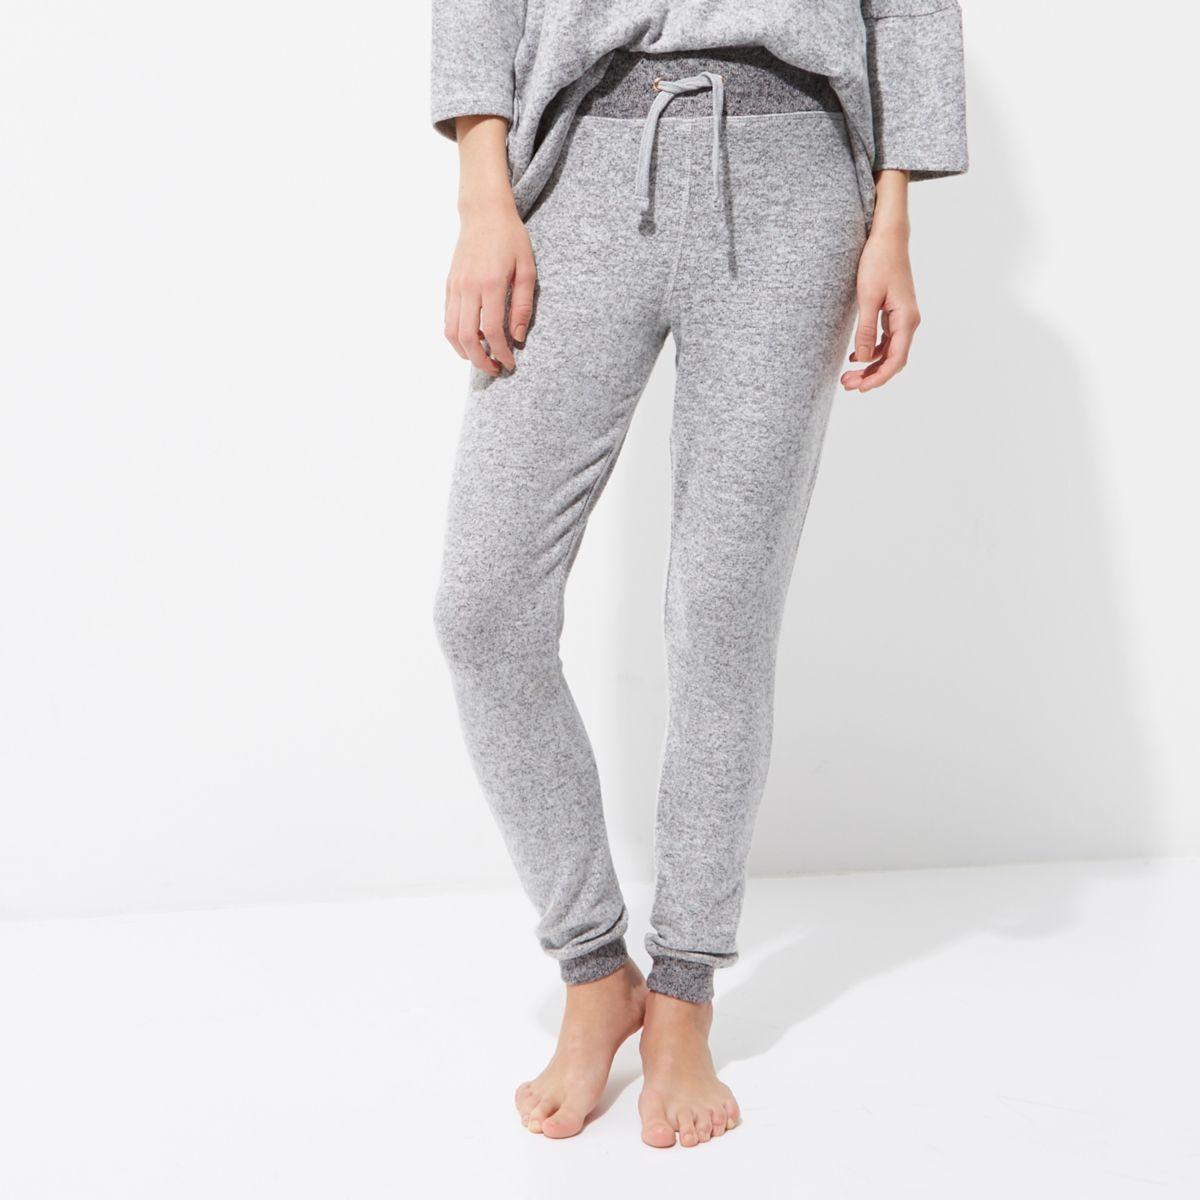 Light grey knitted pajama bottoms